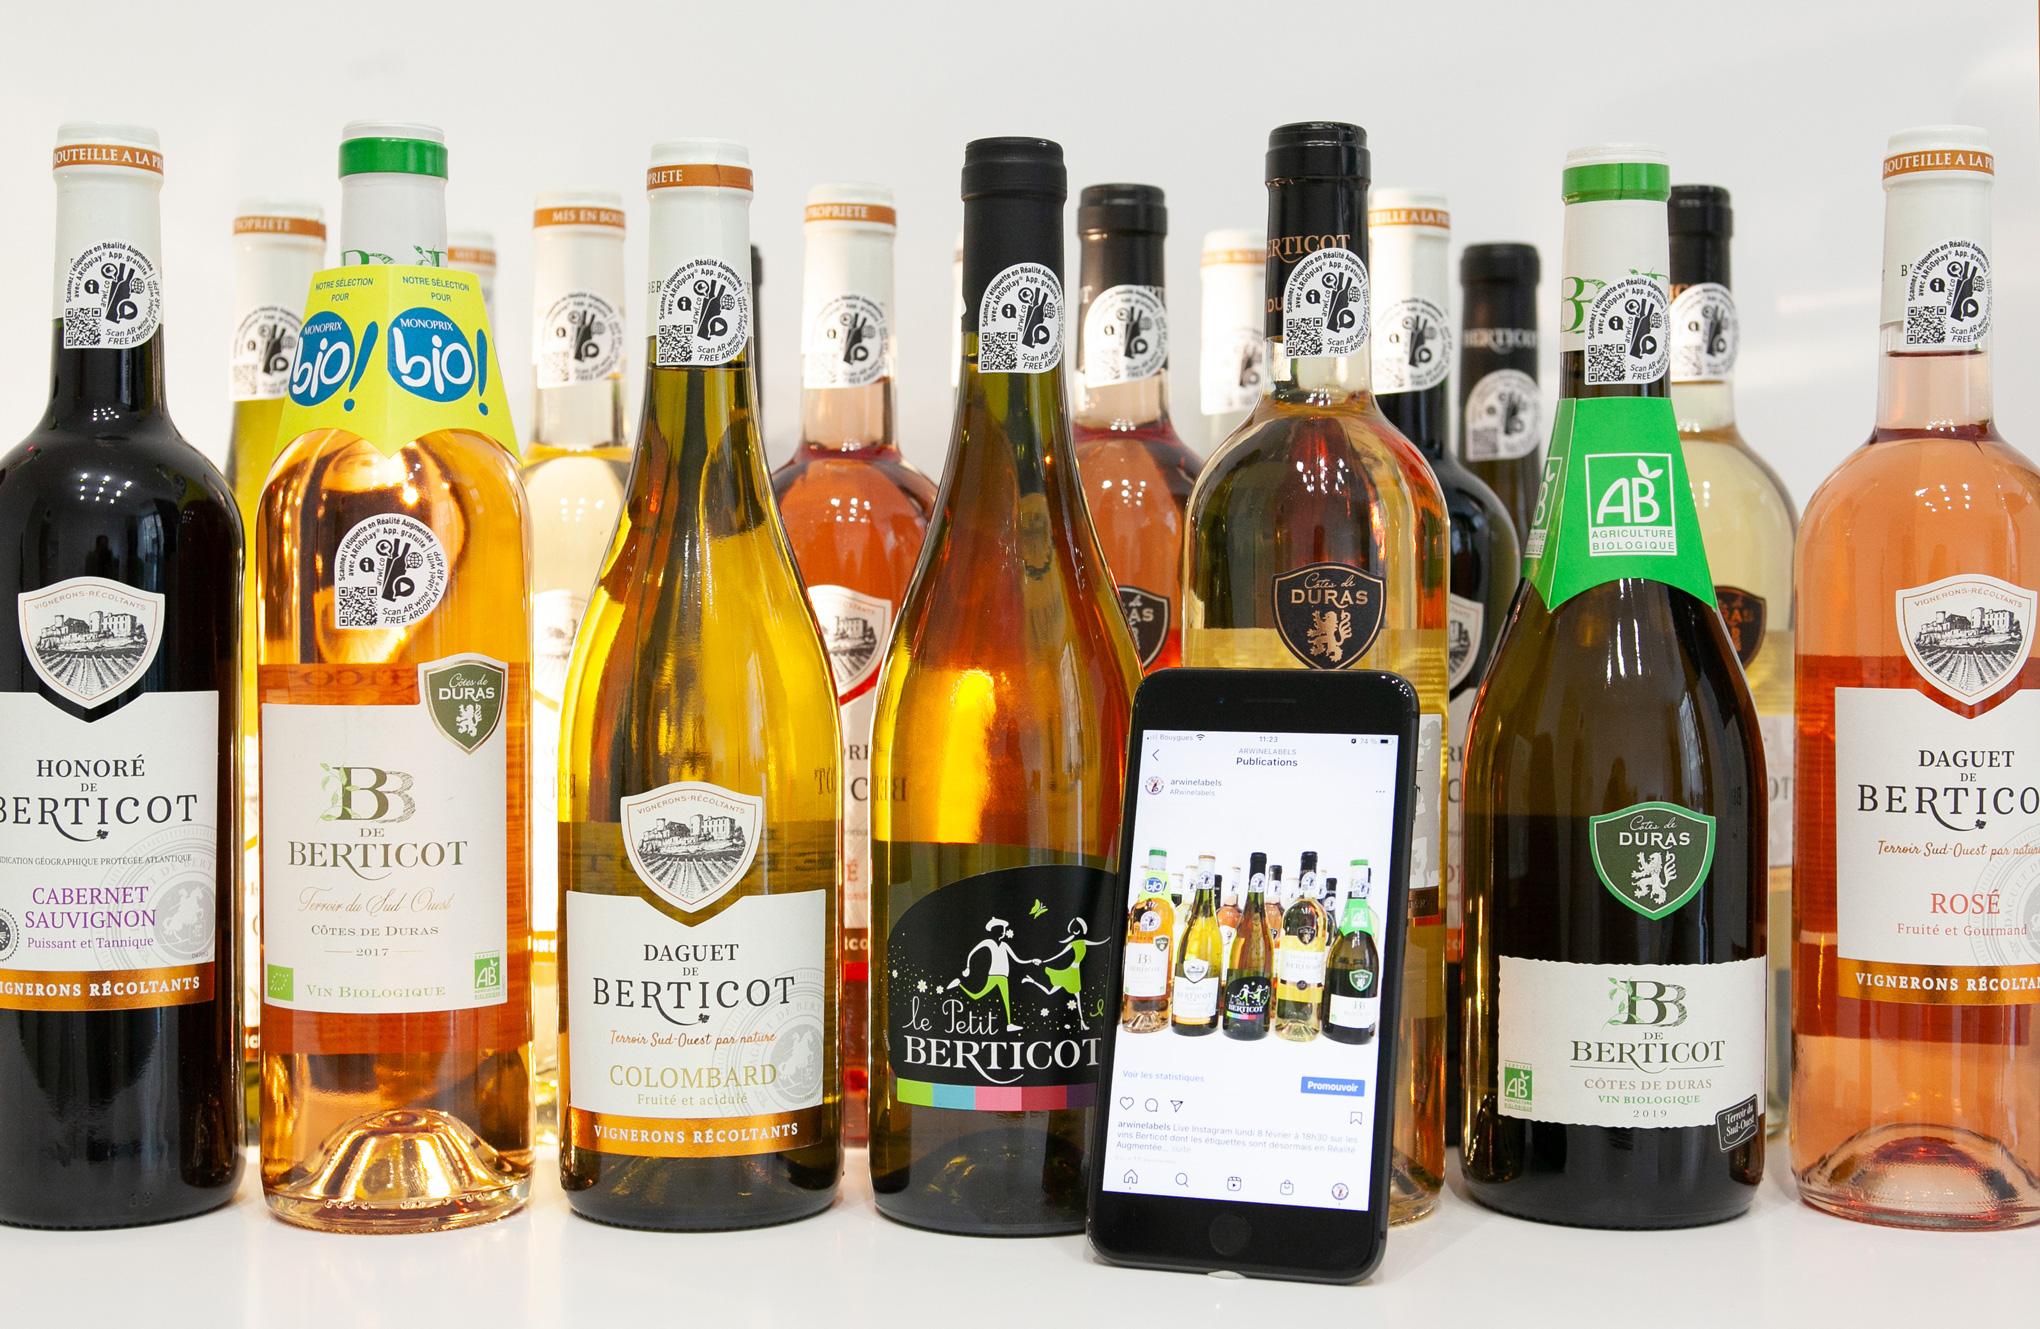 http://ar-winelabels.com/ARWL.CO-Ranges-Berticot-Instagram